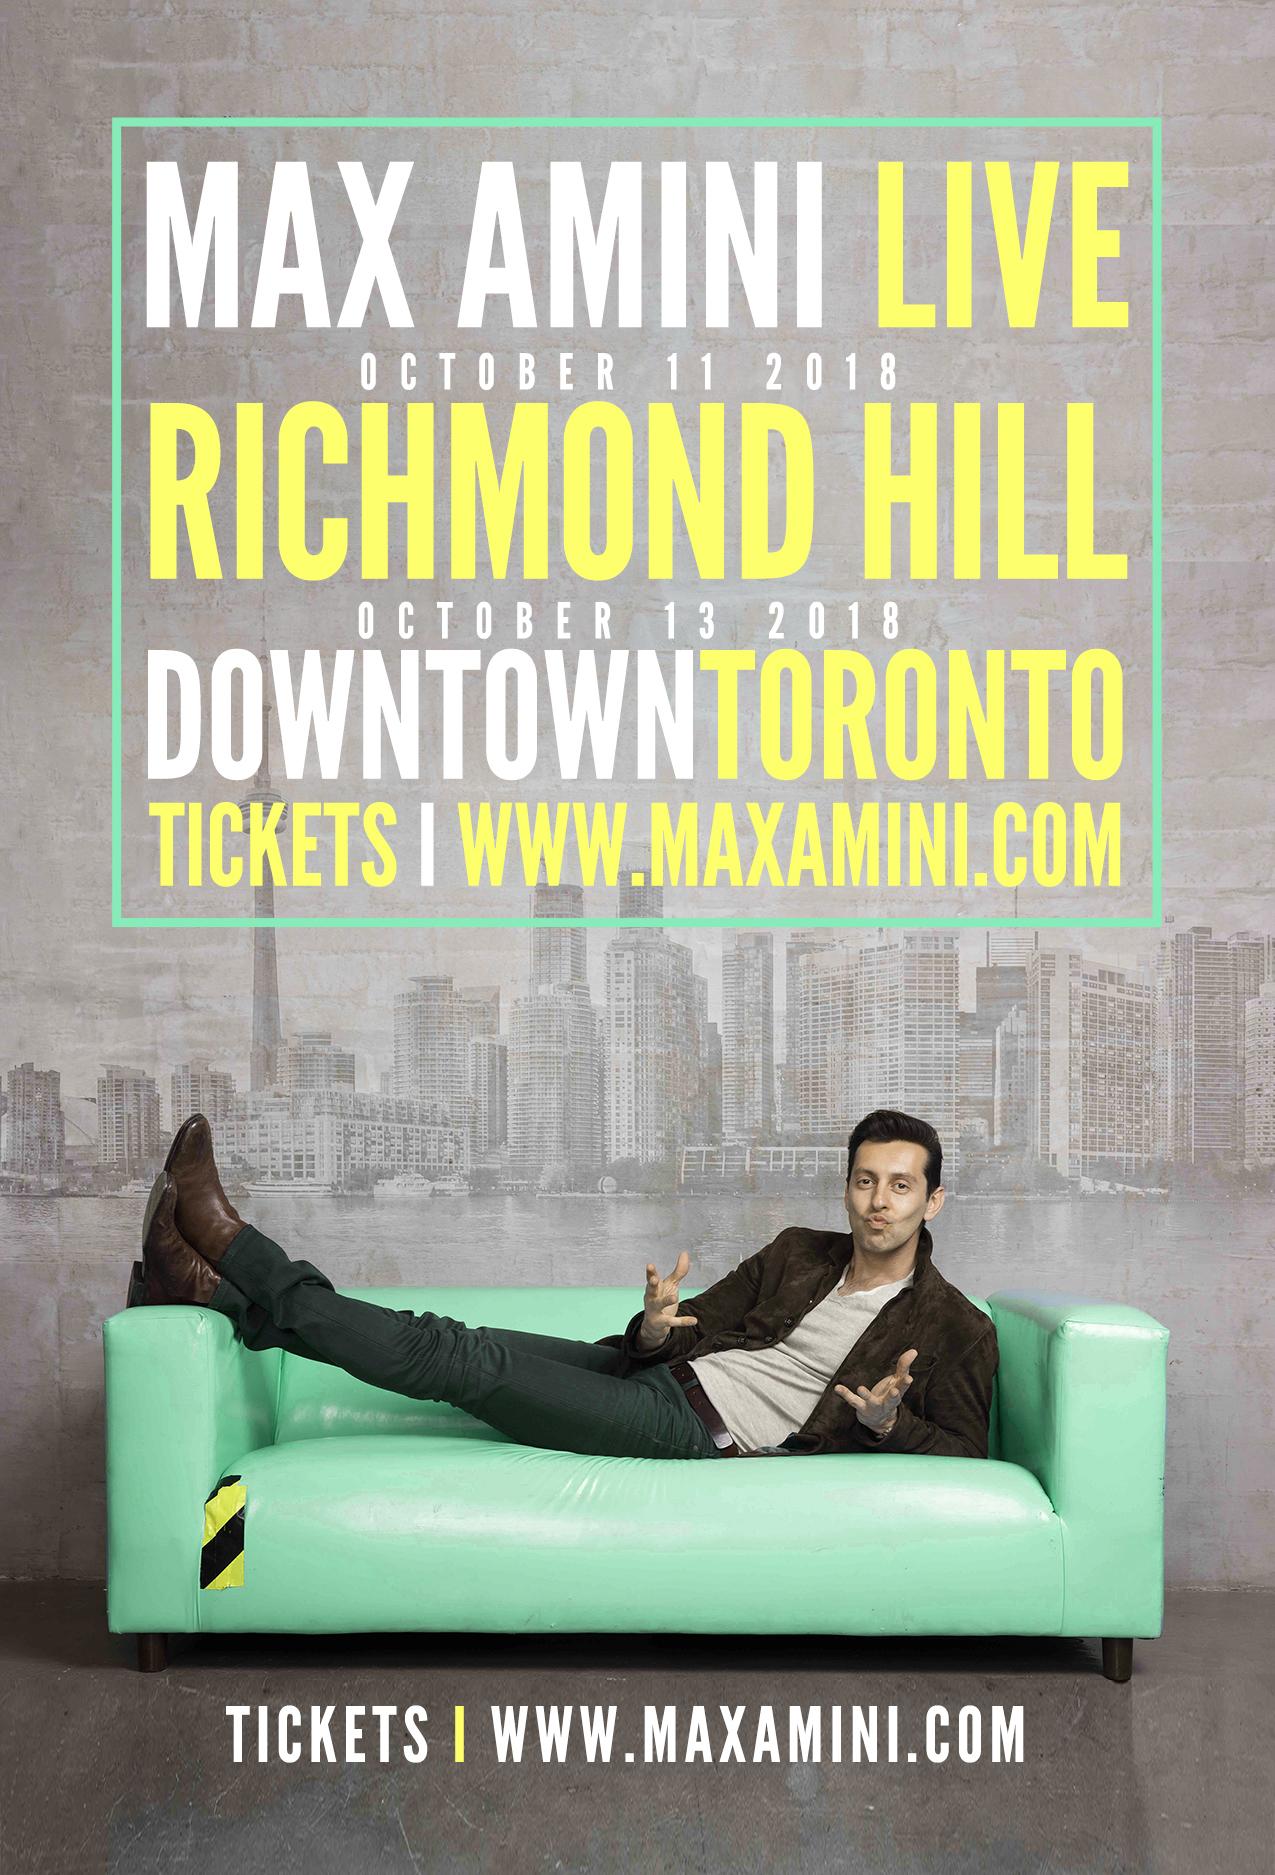 Toronto_Richmond_Hill_4x6.jpg